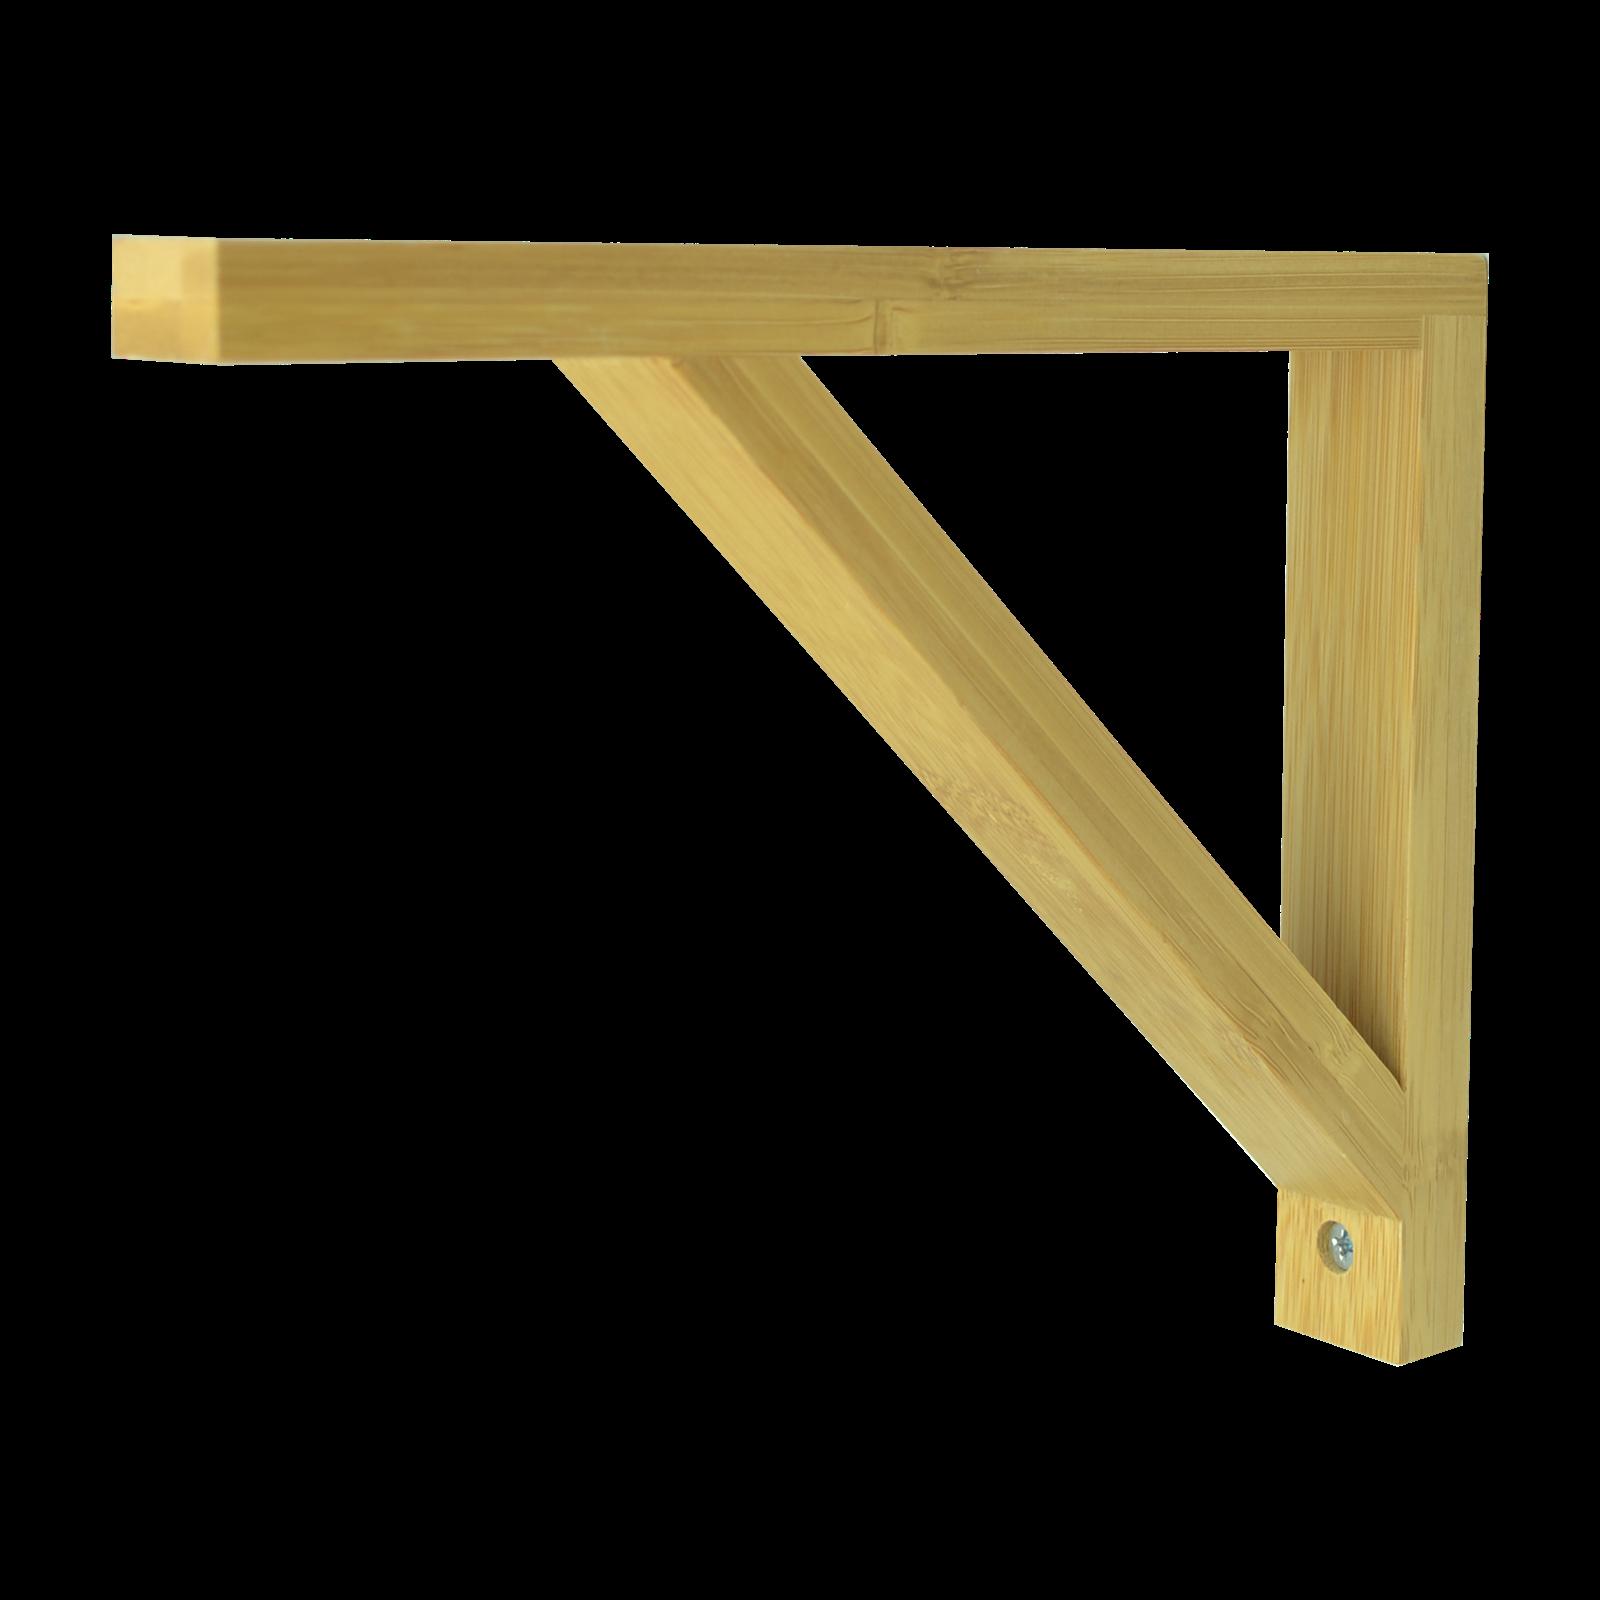 Carinya 170 x 210 x 30 x 15mm Varnished Bamboo Angle Bracket